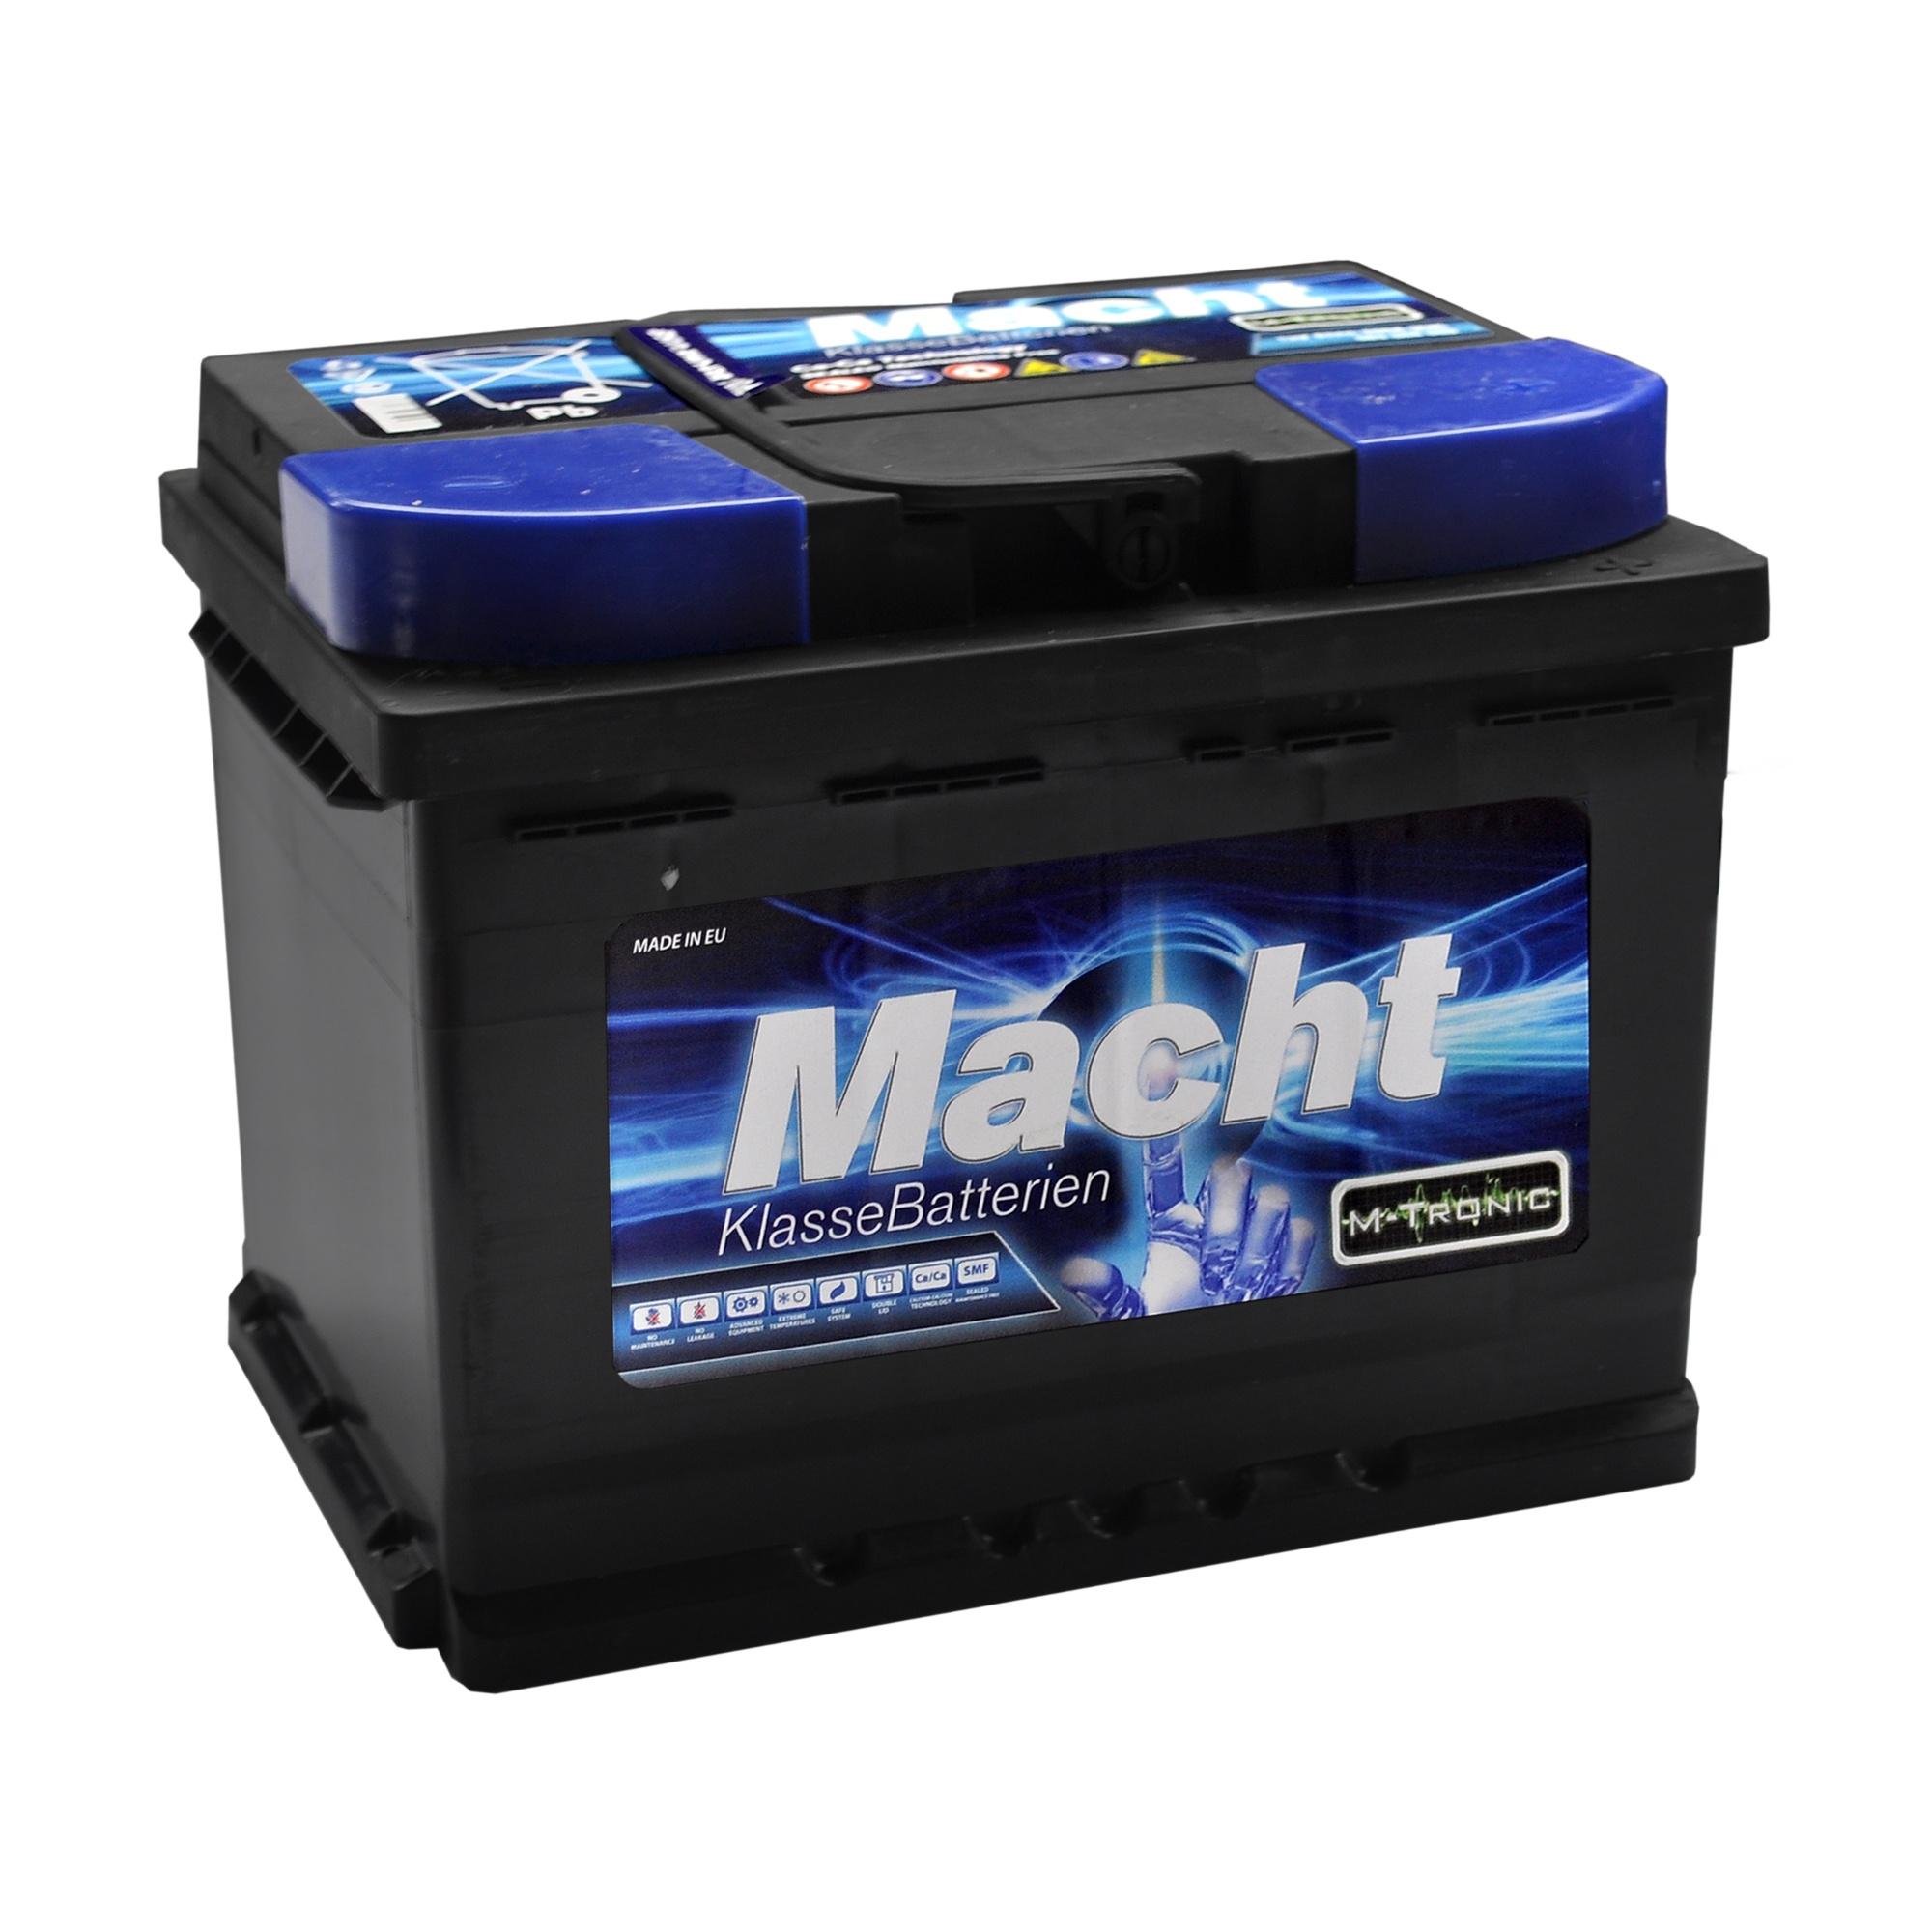 Baterie auto MACHT 25634 M-Tronic 12V 63 Ah 600A - 3 ANI GARANTIE